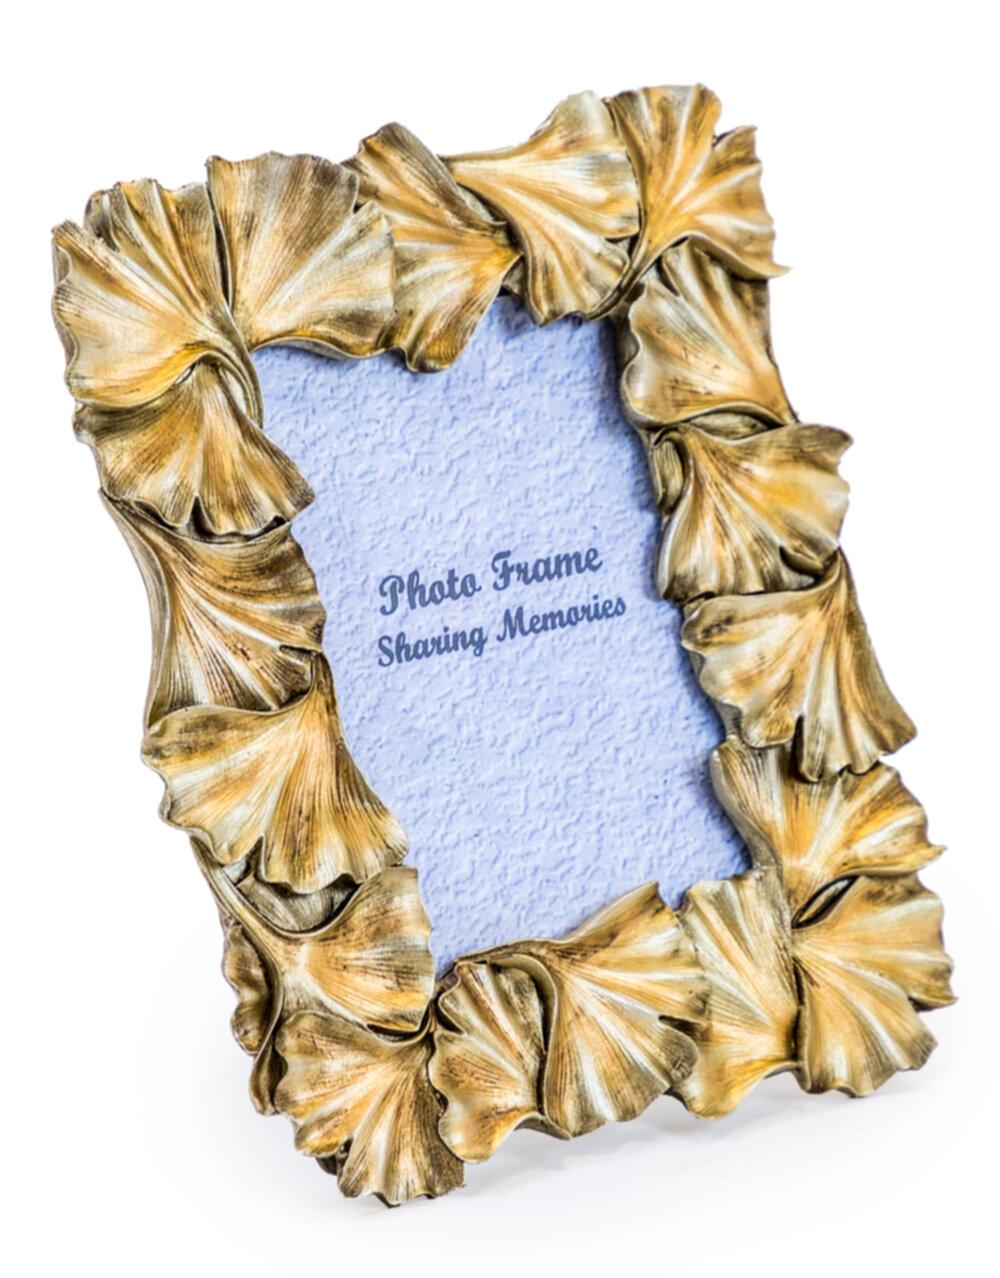 "Antique Gold 4x6 Ginkgo Leaf Photo Frame"""